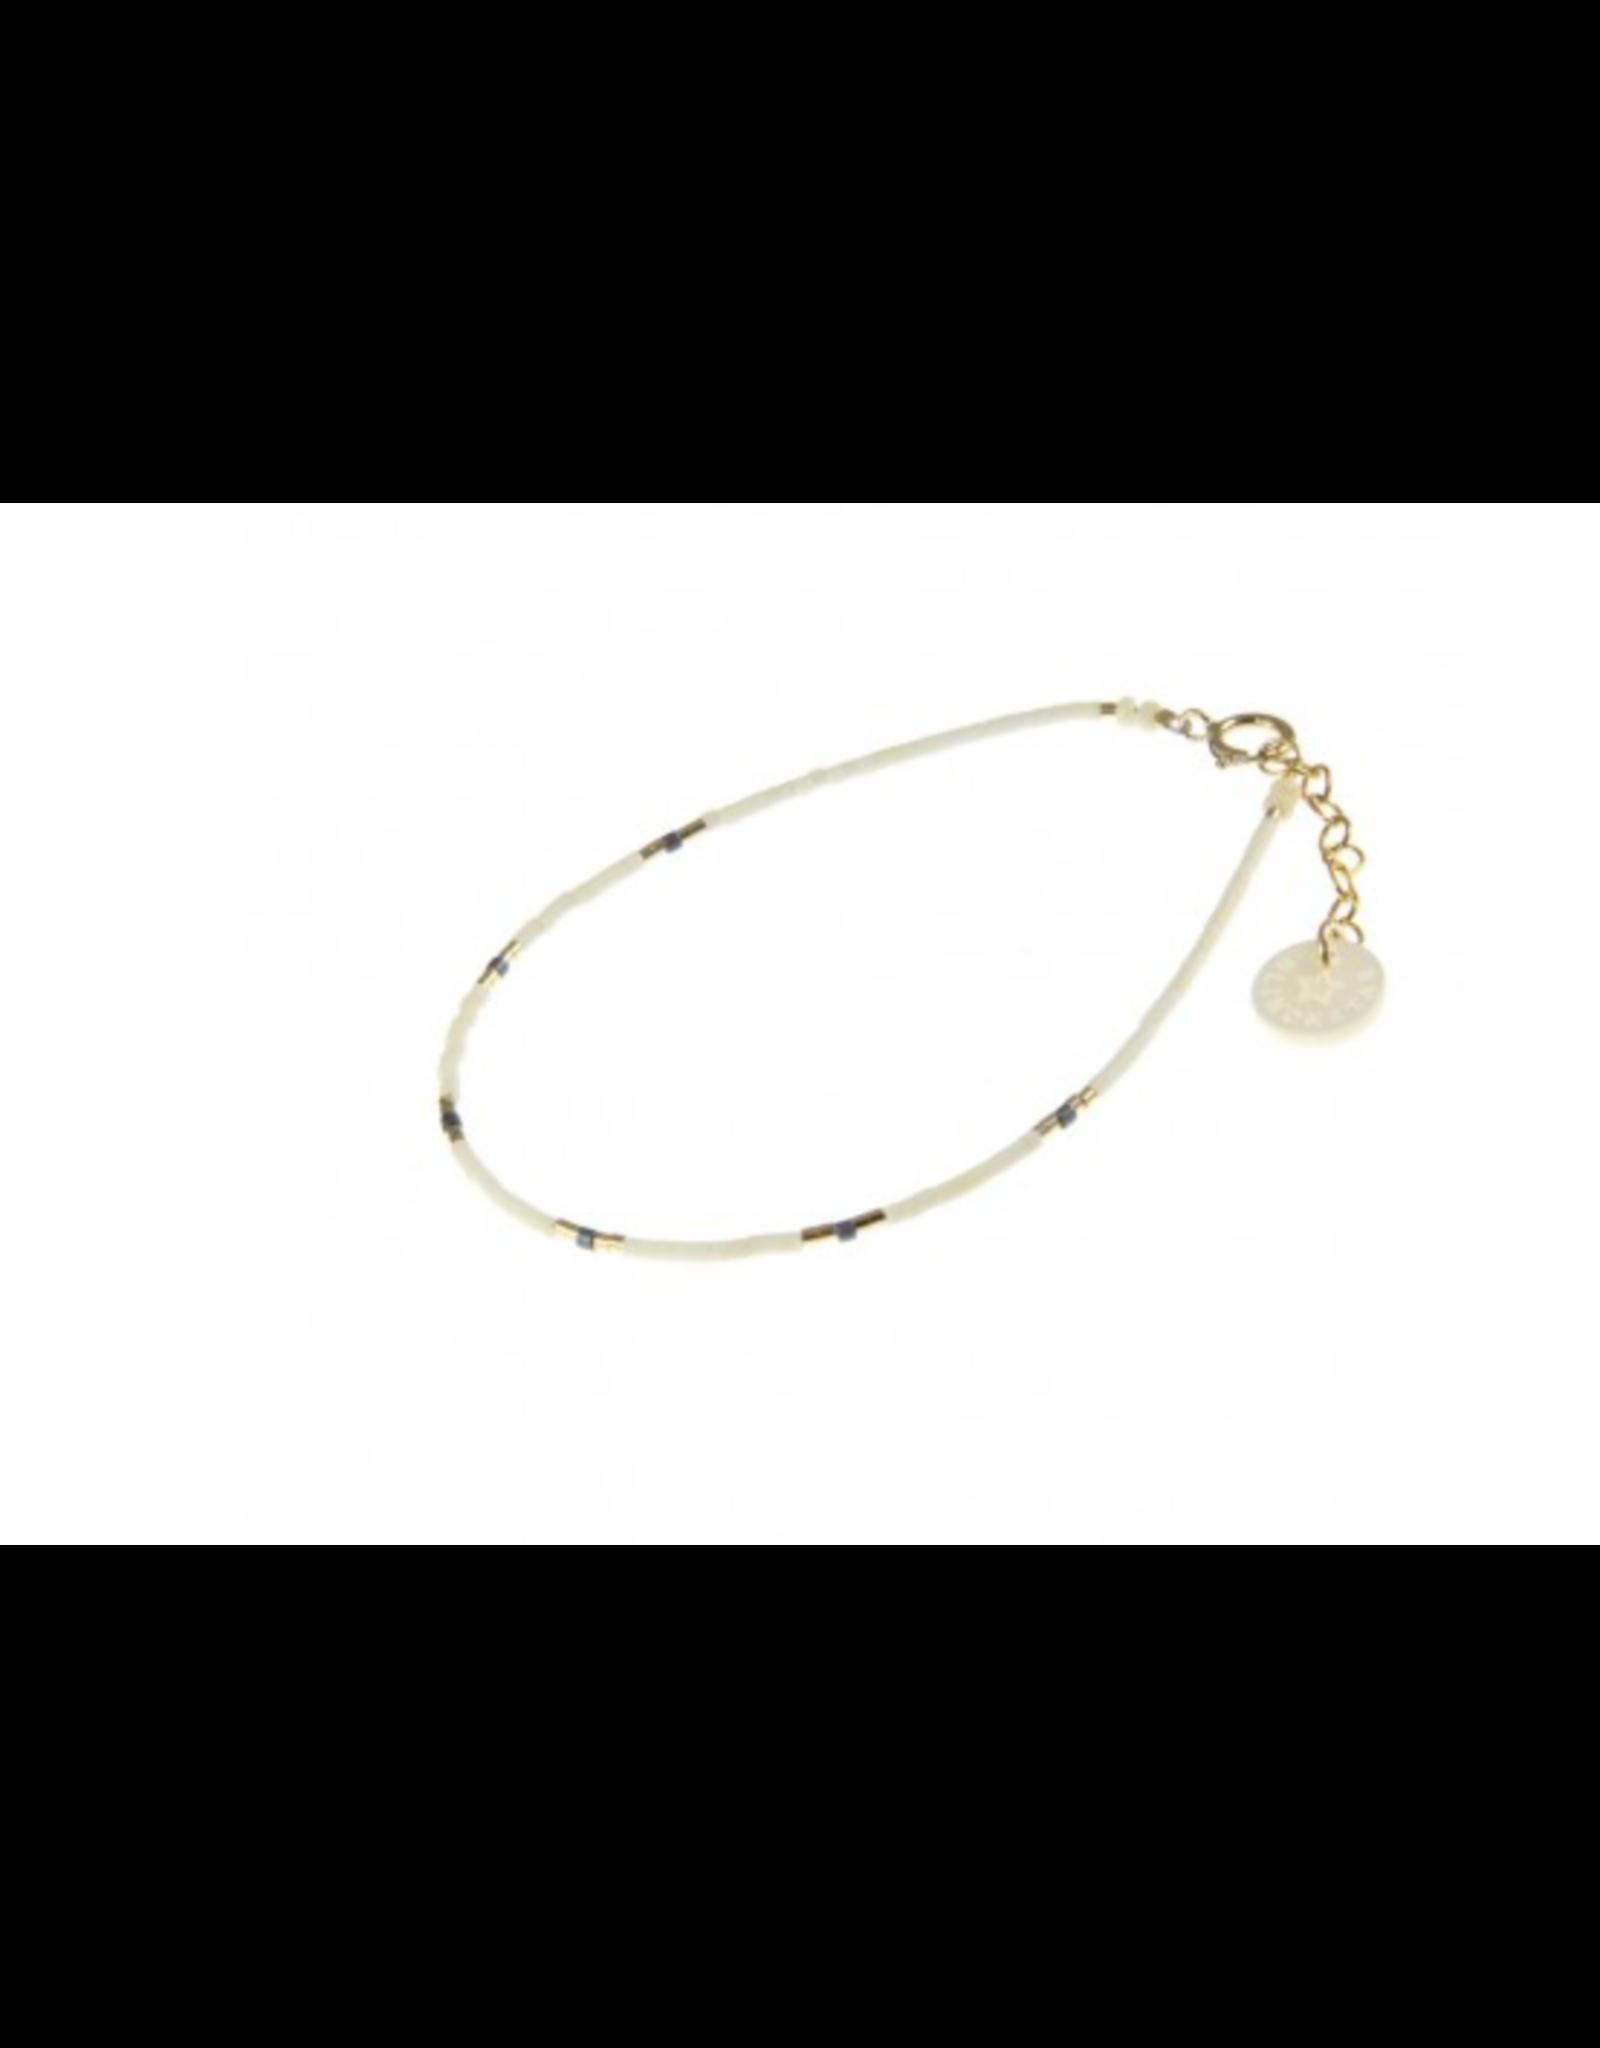 blinckstar armband 1901A18